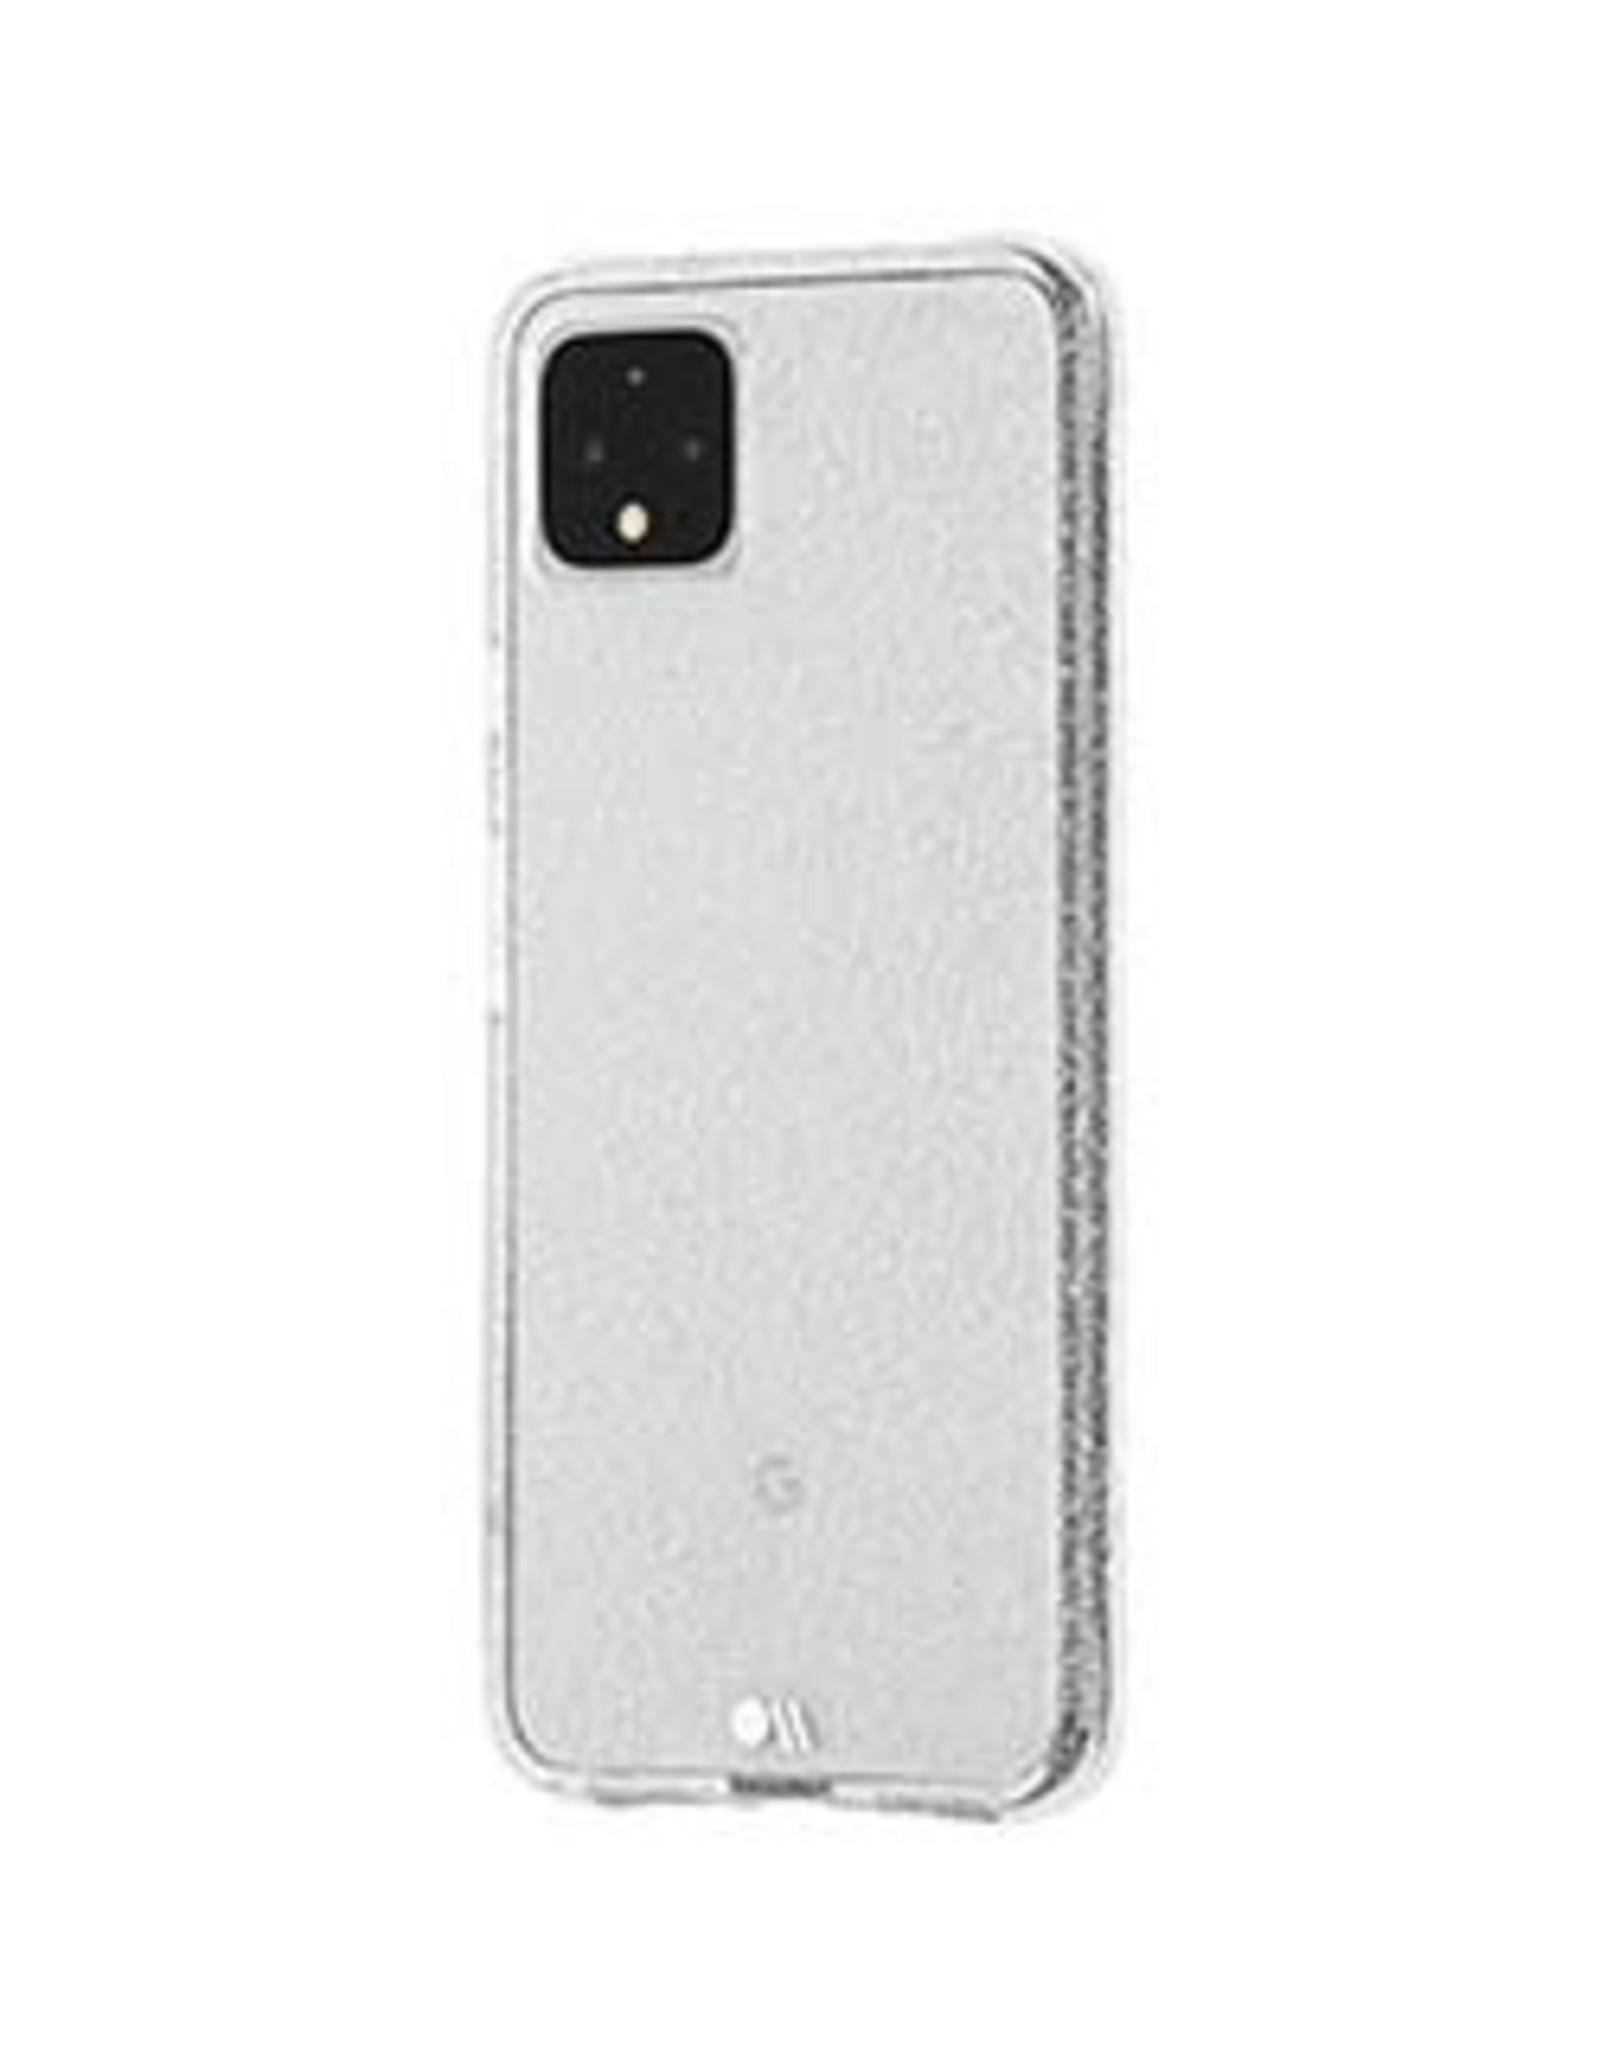 Case-Mate Case-Mate | Google Pixel 4 XL Clear Sheer Crystal Case 15-06316